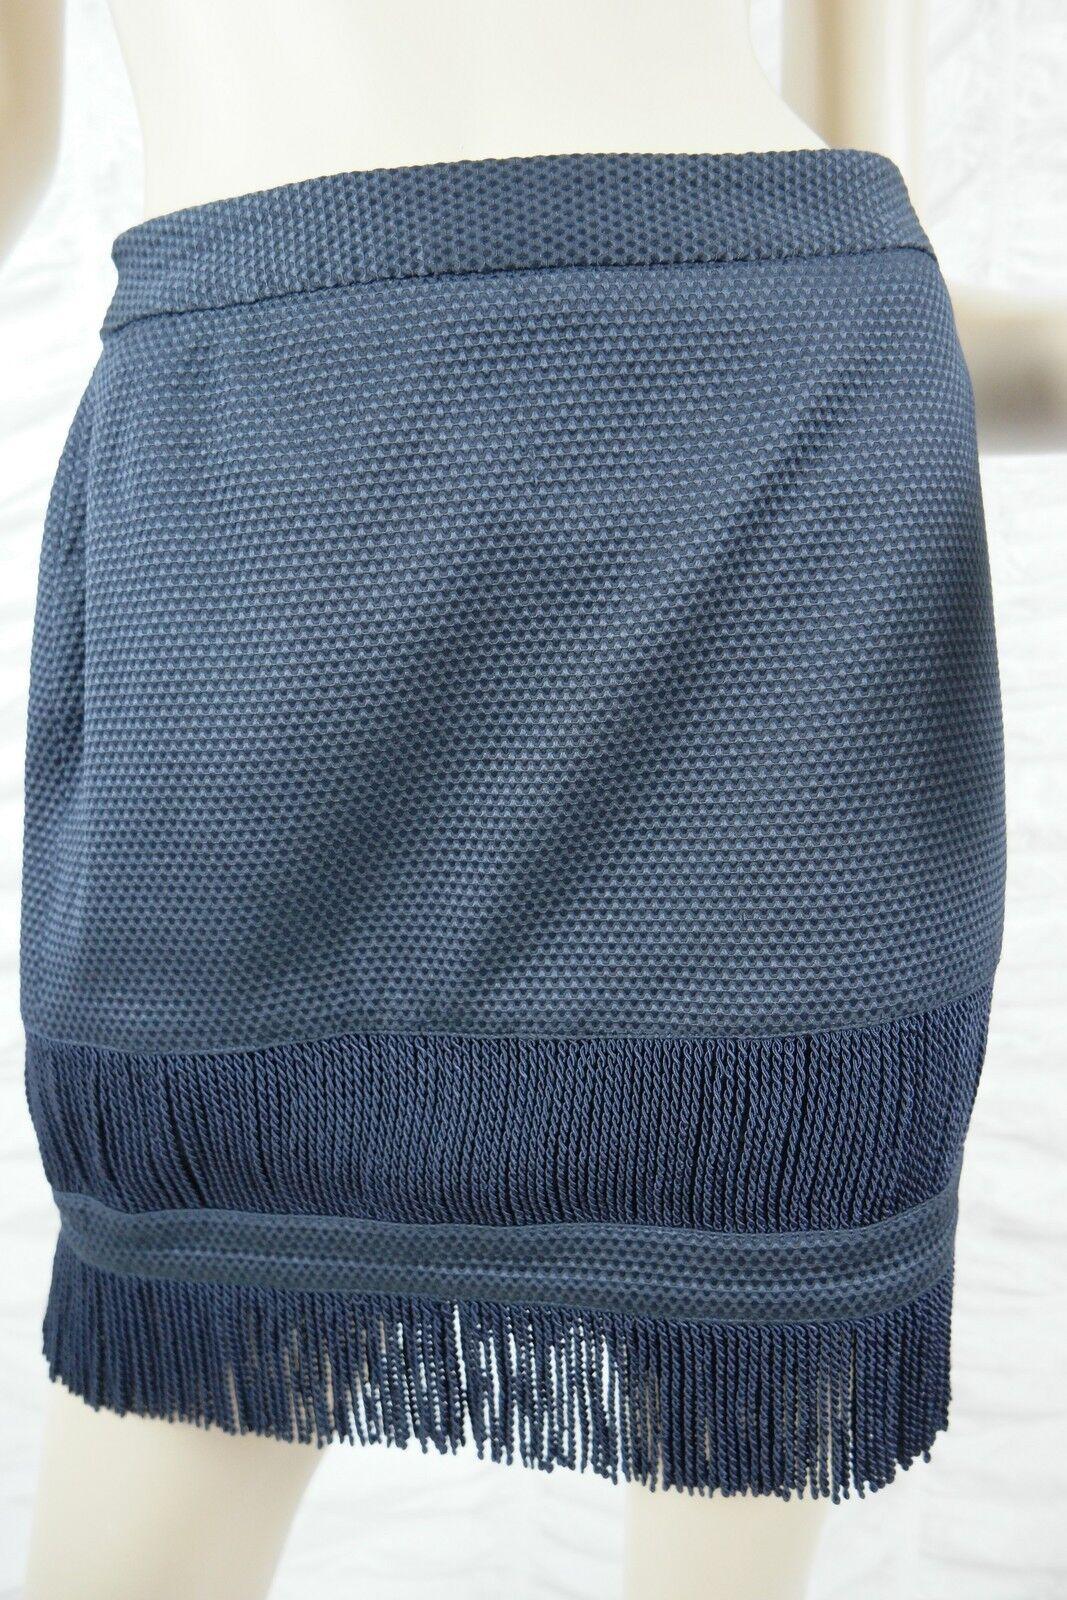 SASS & BIDE navy bluee textured On The Fringe tassle A-line mini skirt size 8 GUC